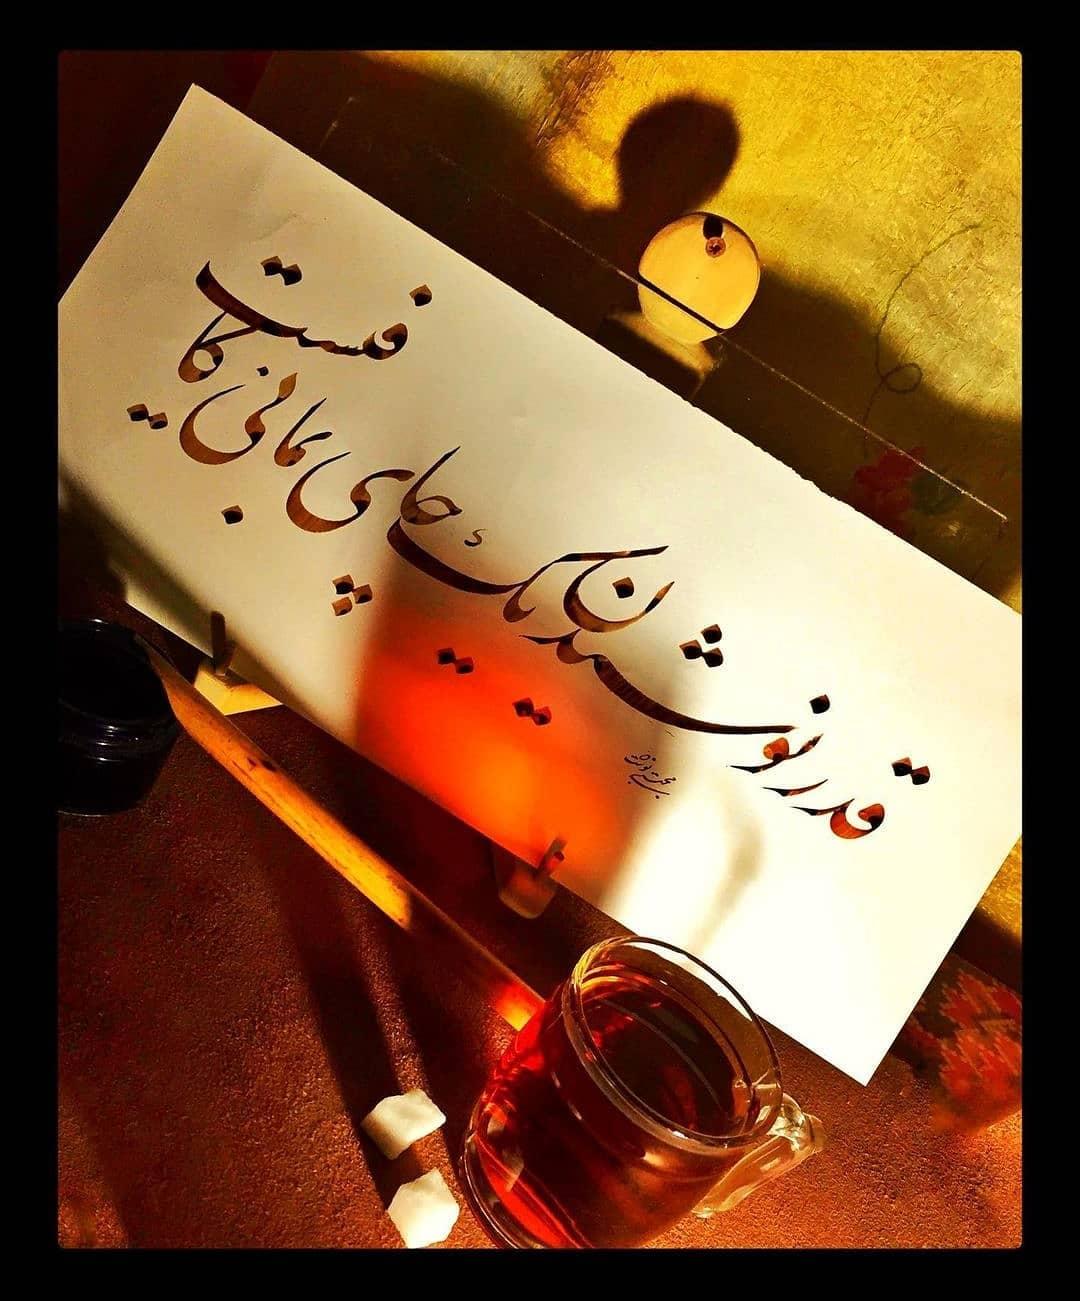 Farisi/Nasta'liq khatestan  ﷽ قدر نوشیدن یک چای بمانی کافیست . #خطستان  @khatestan #خط_خودکاری#خط_خودکاری_ن… 692